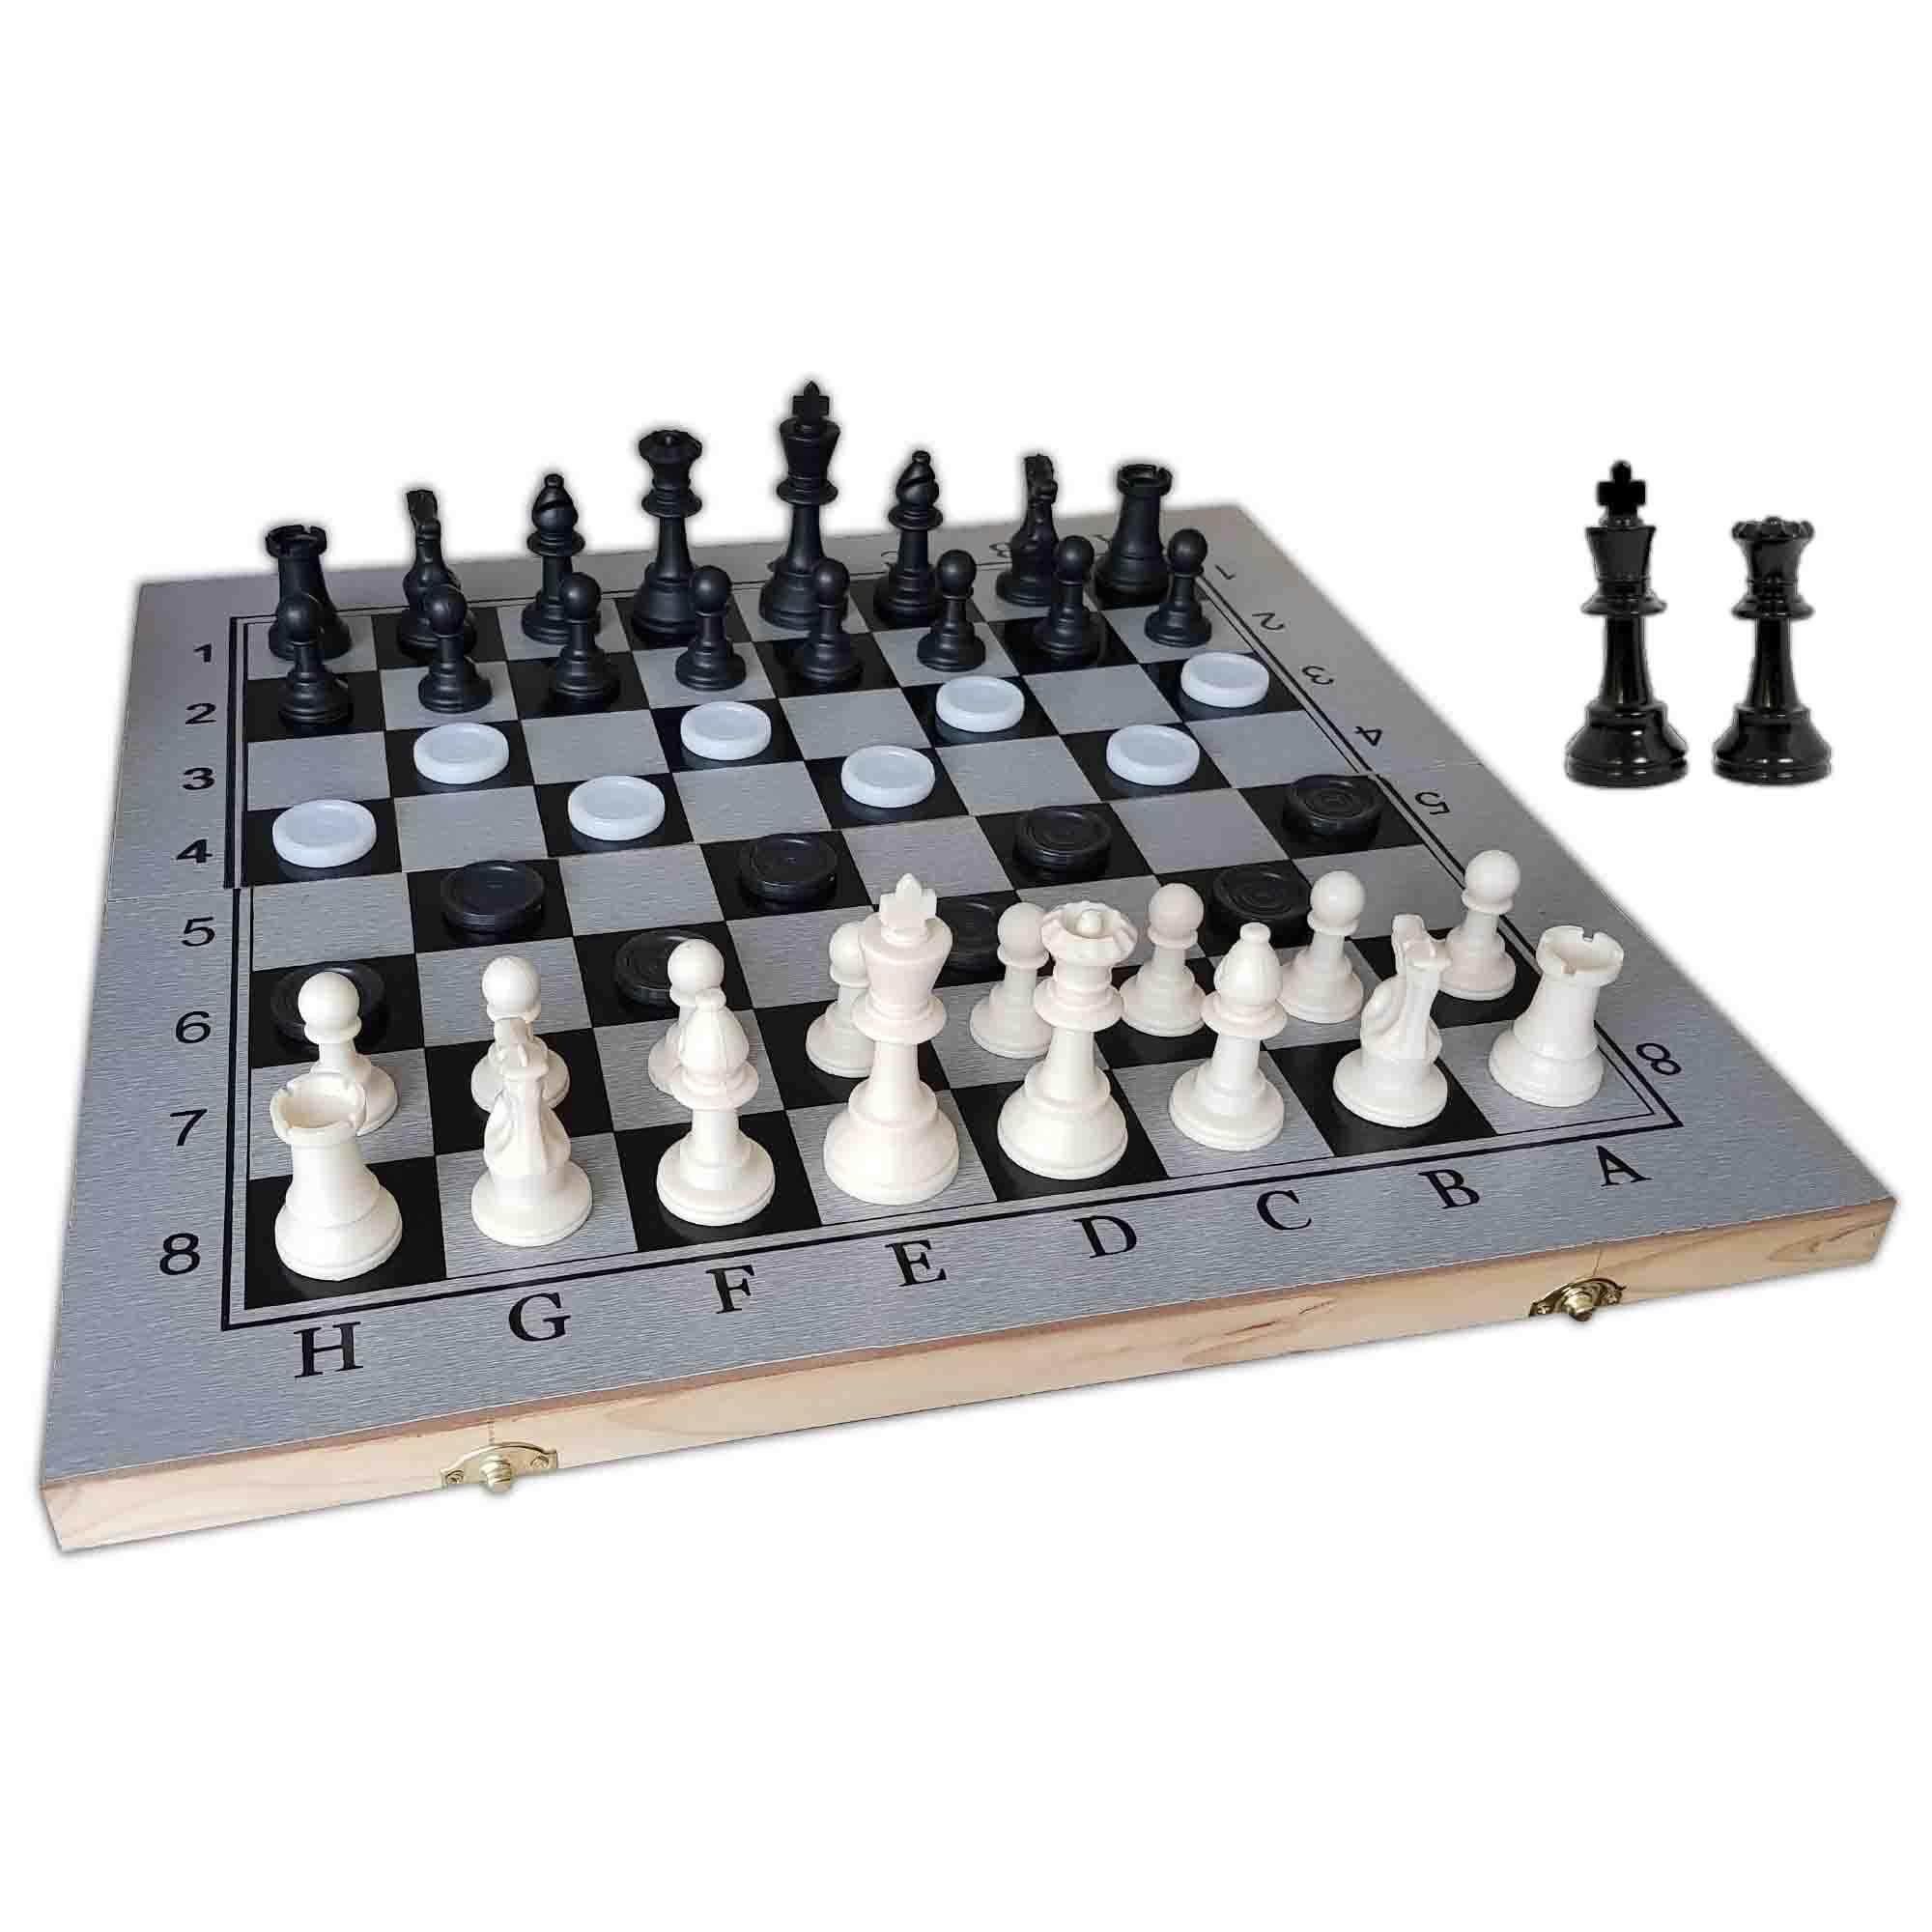 Portable Tournament Chess Set 3 in 1 (Chess & Checkers & Backgammon) 48 CM X 48 CM